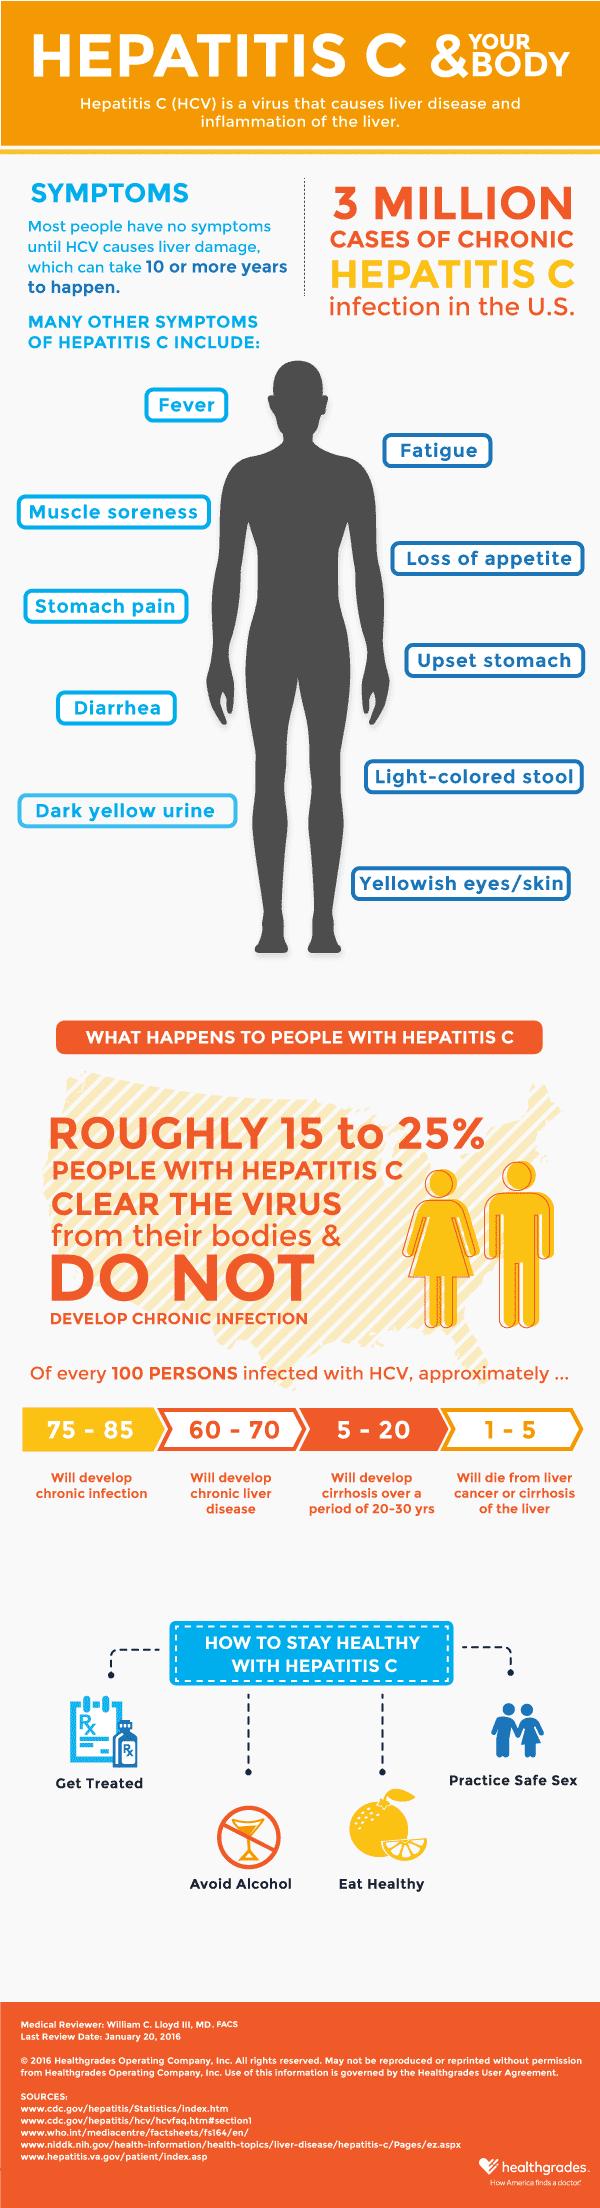 Hepatitis C and Your Body Infographic